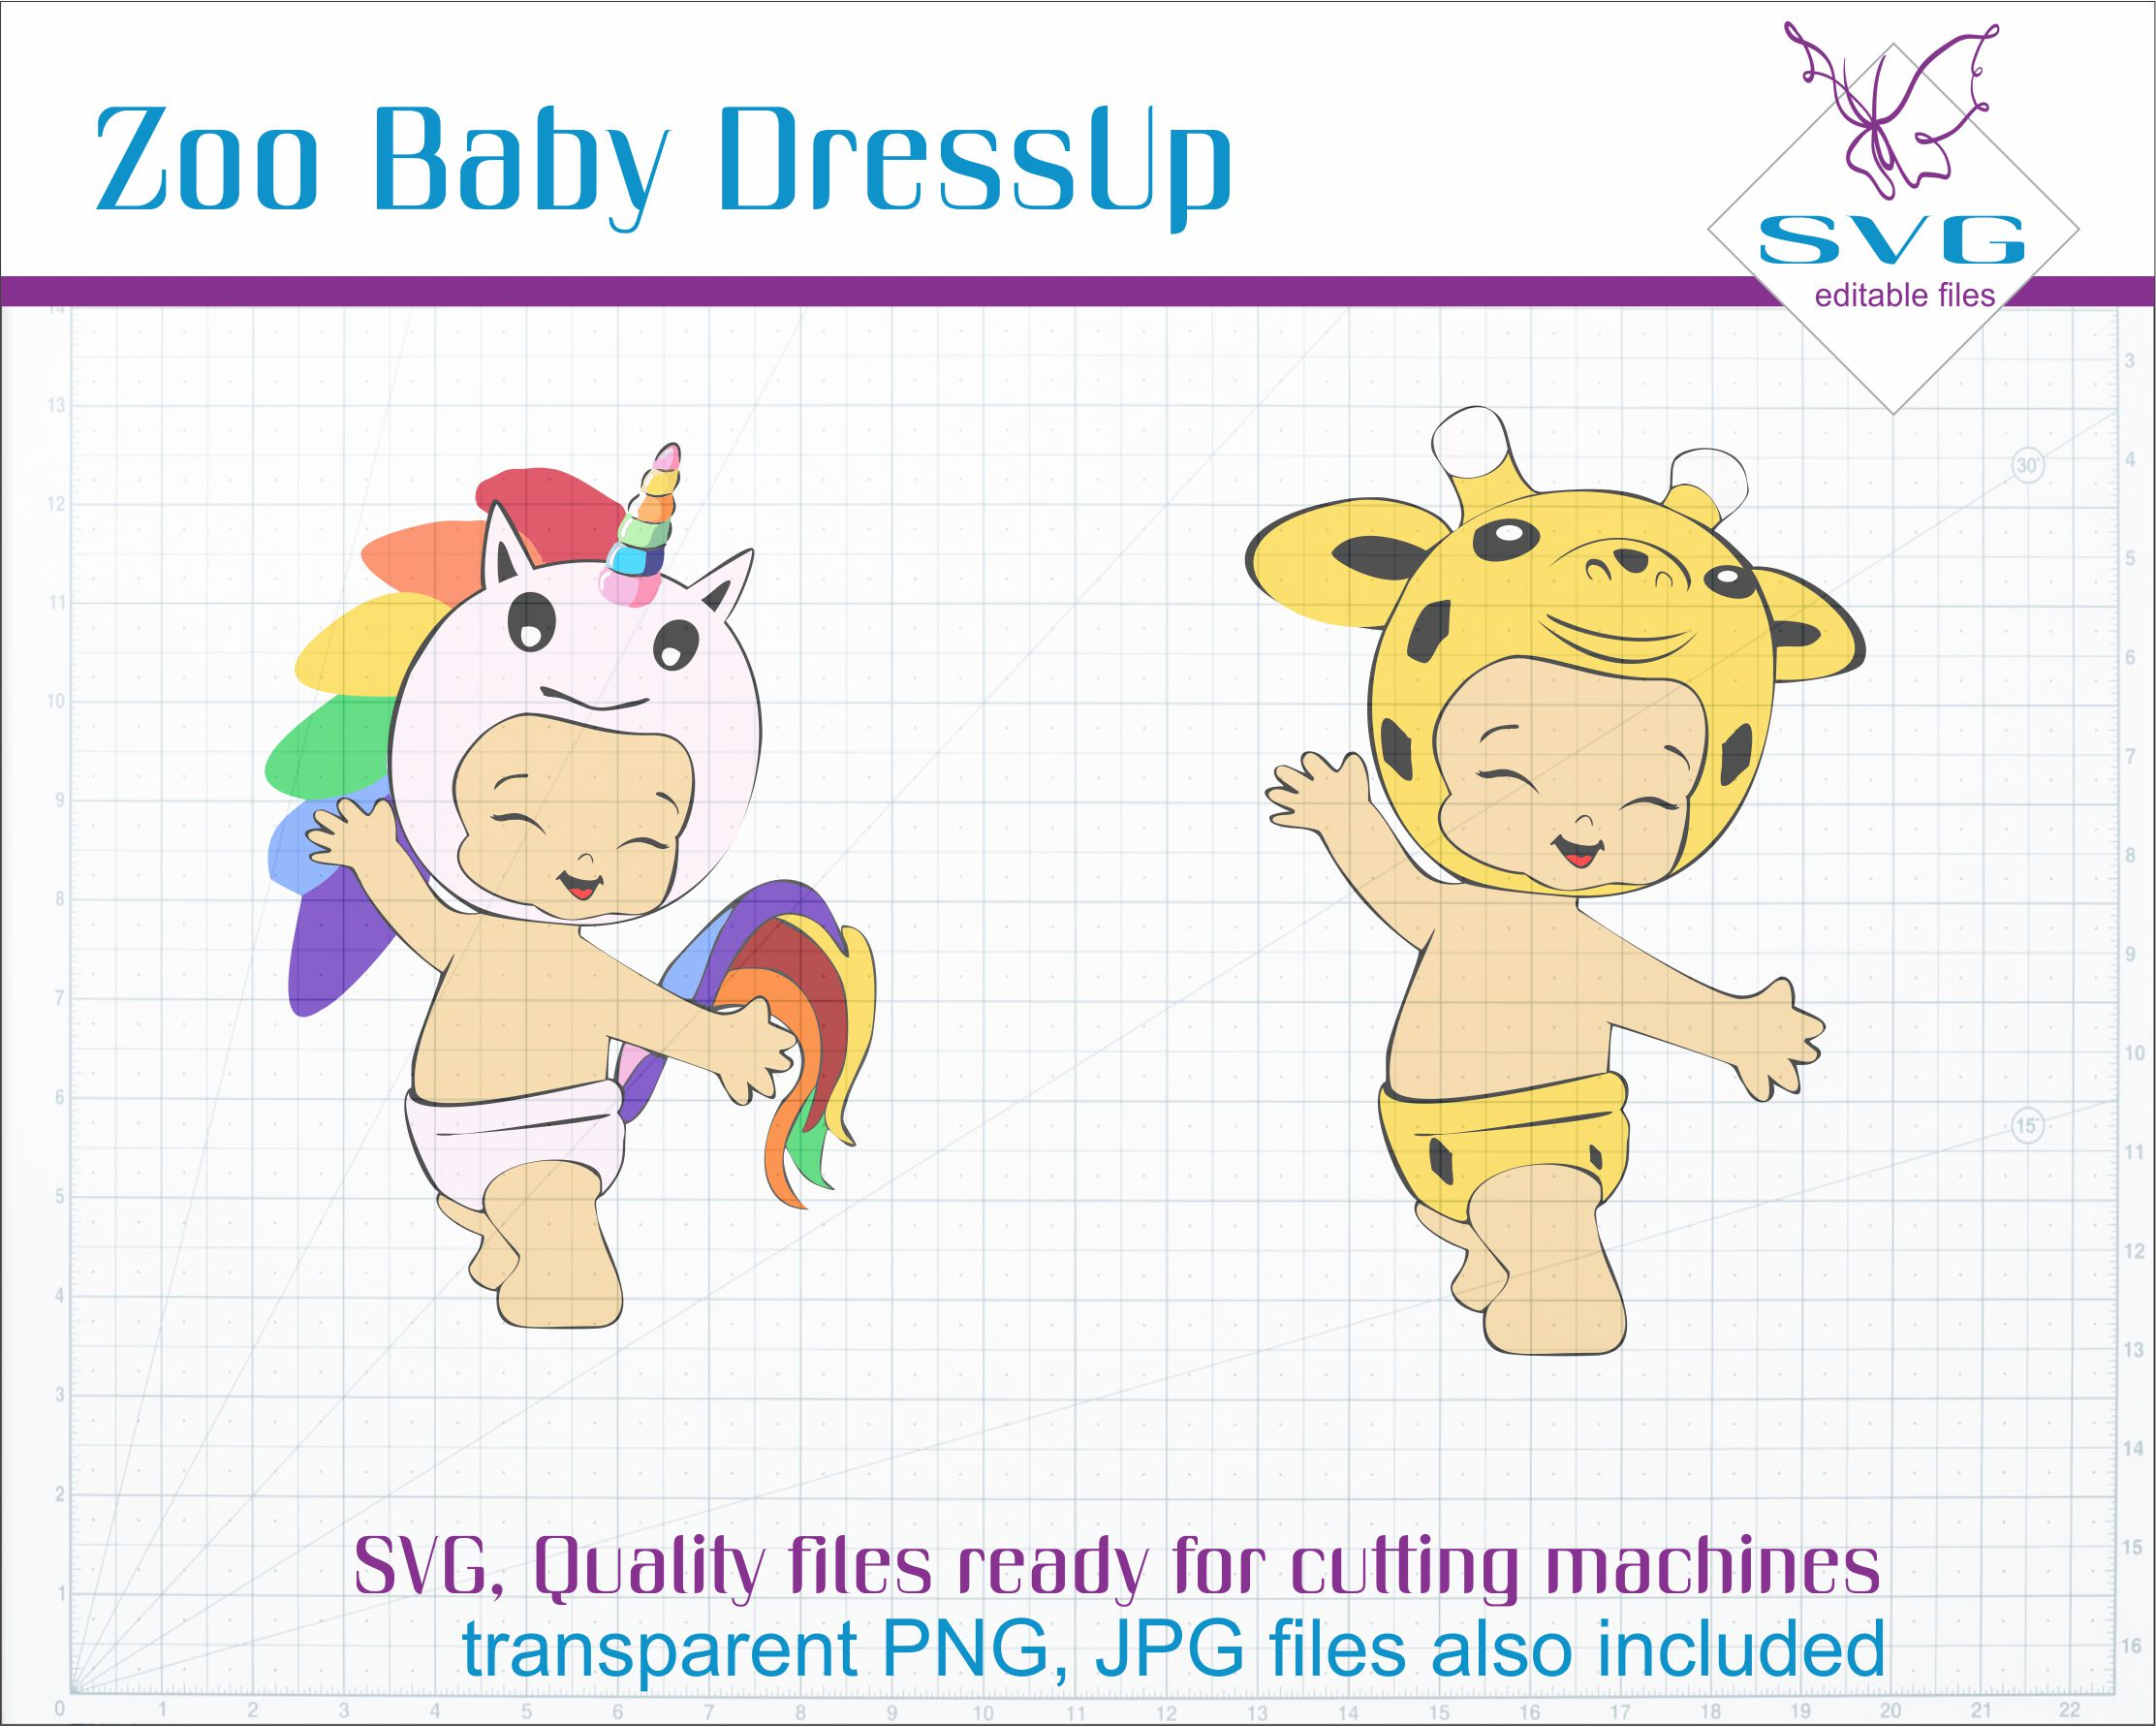 Zoo Baby Dressup example image 2